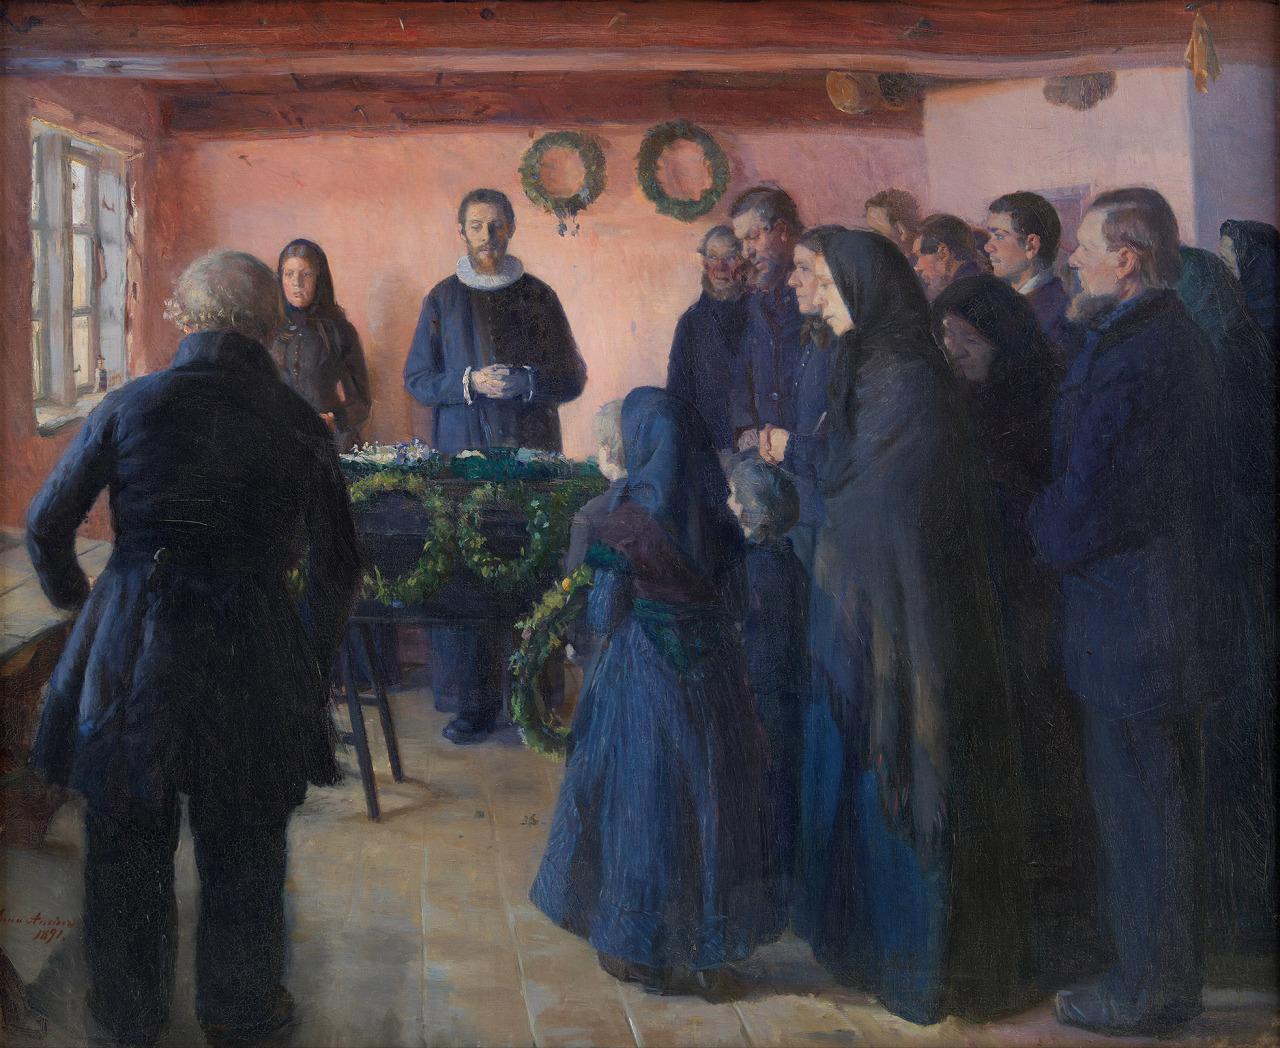 Anna Ancher, Un funeral,1891